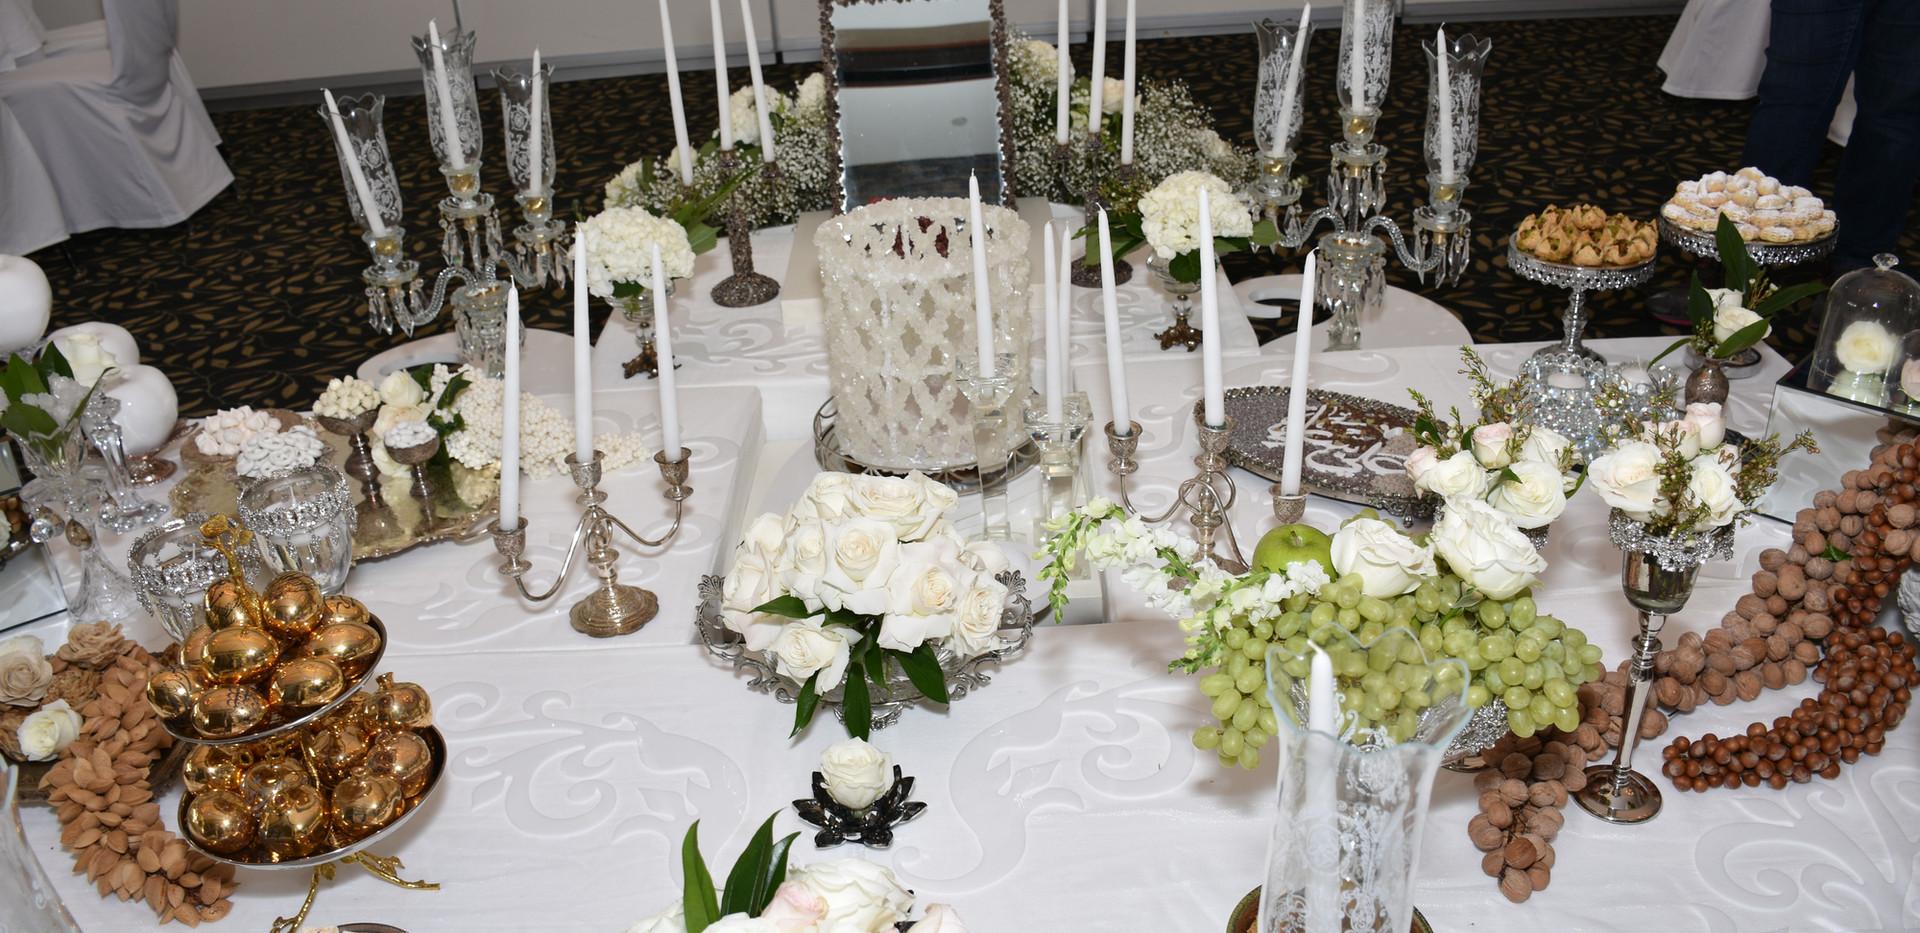 Romantic White and Silver setup